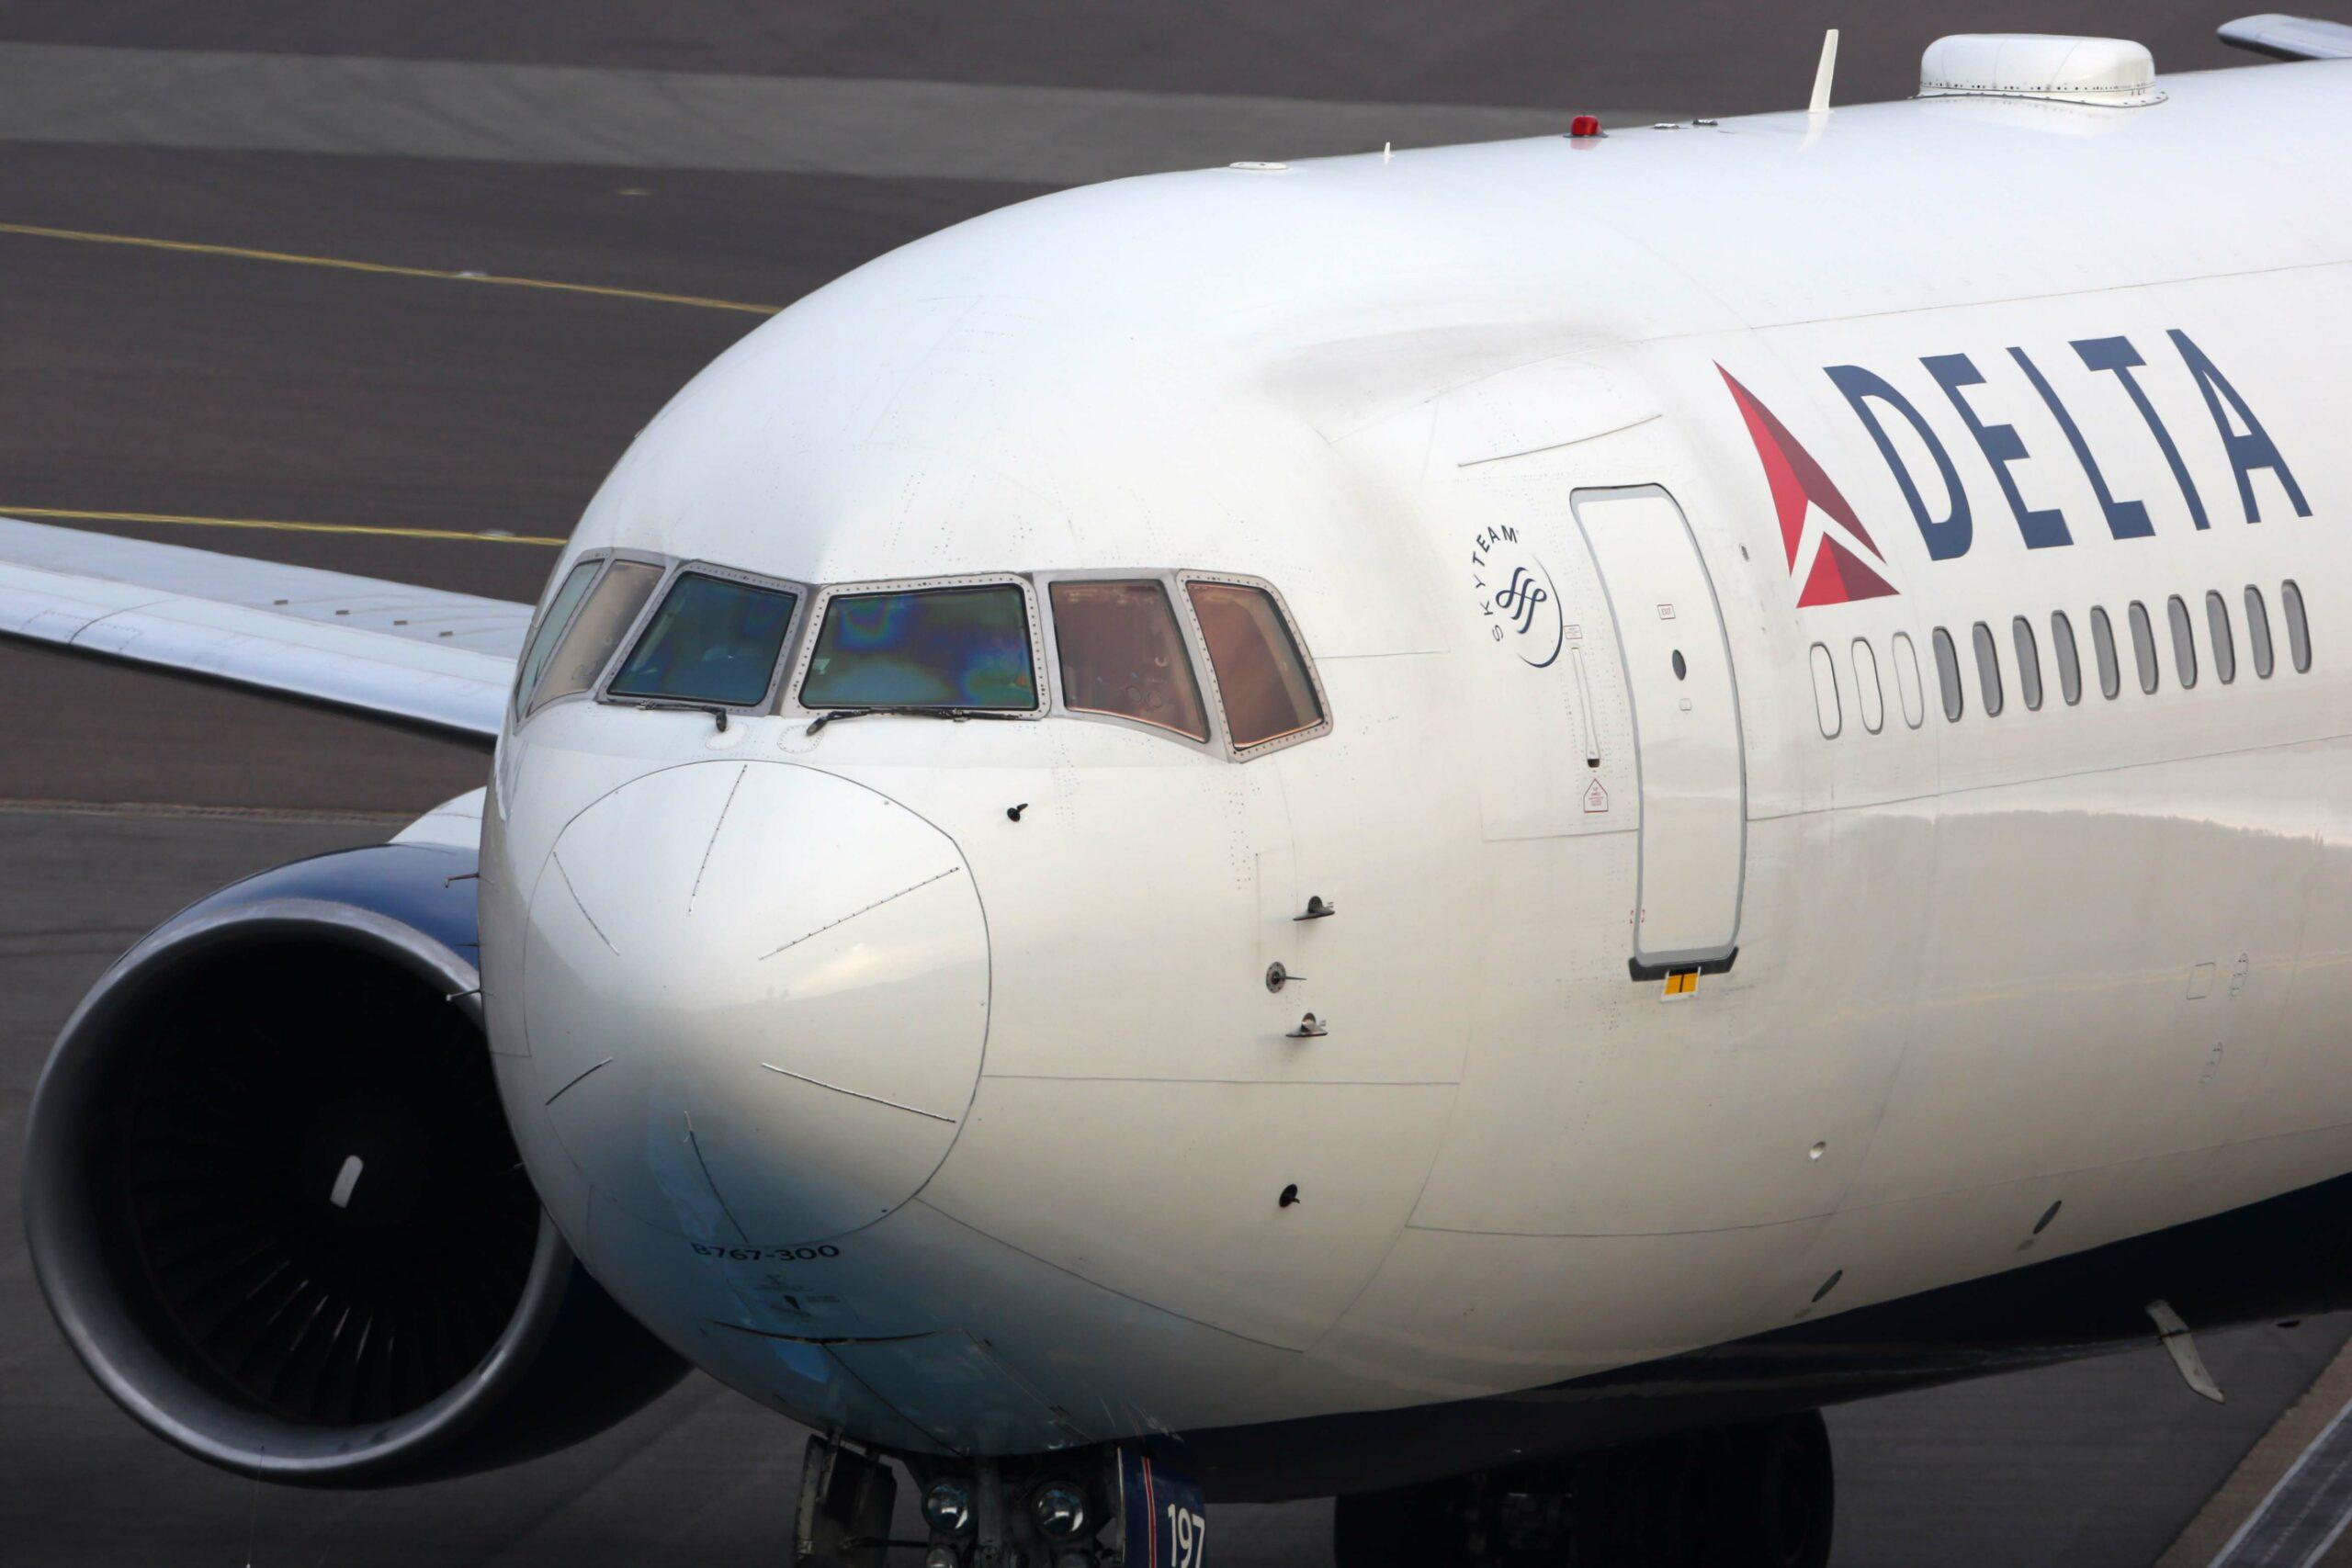 Delta Air Lines decreasing losses by $ 2.1 billion in Q4 2020 1